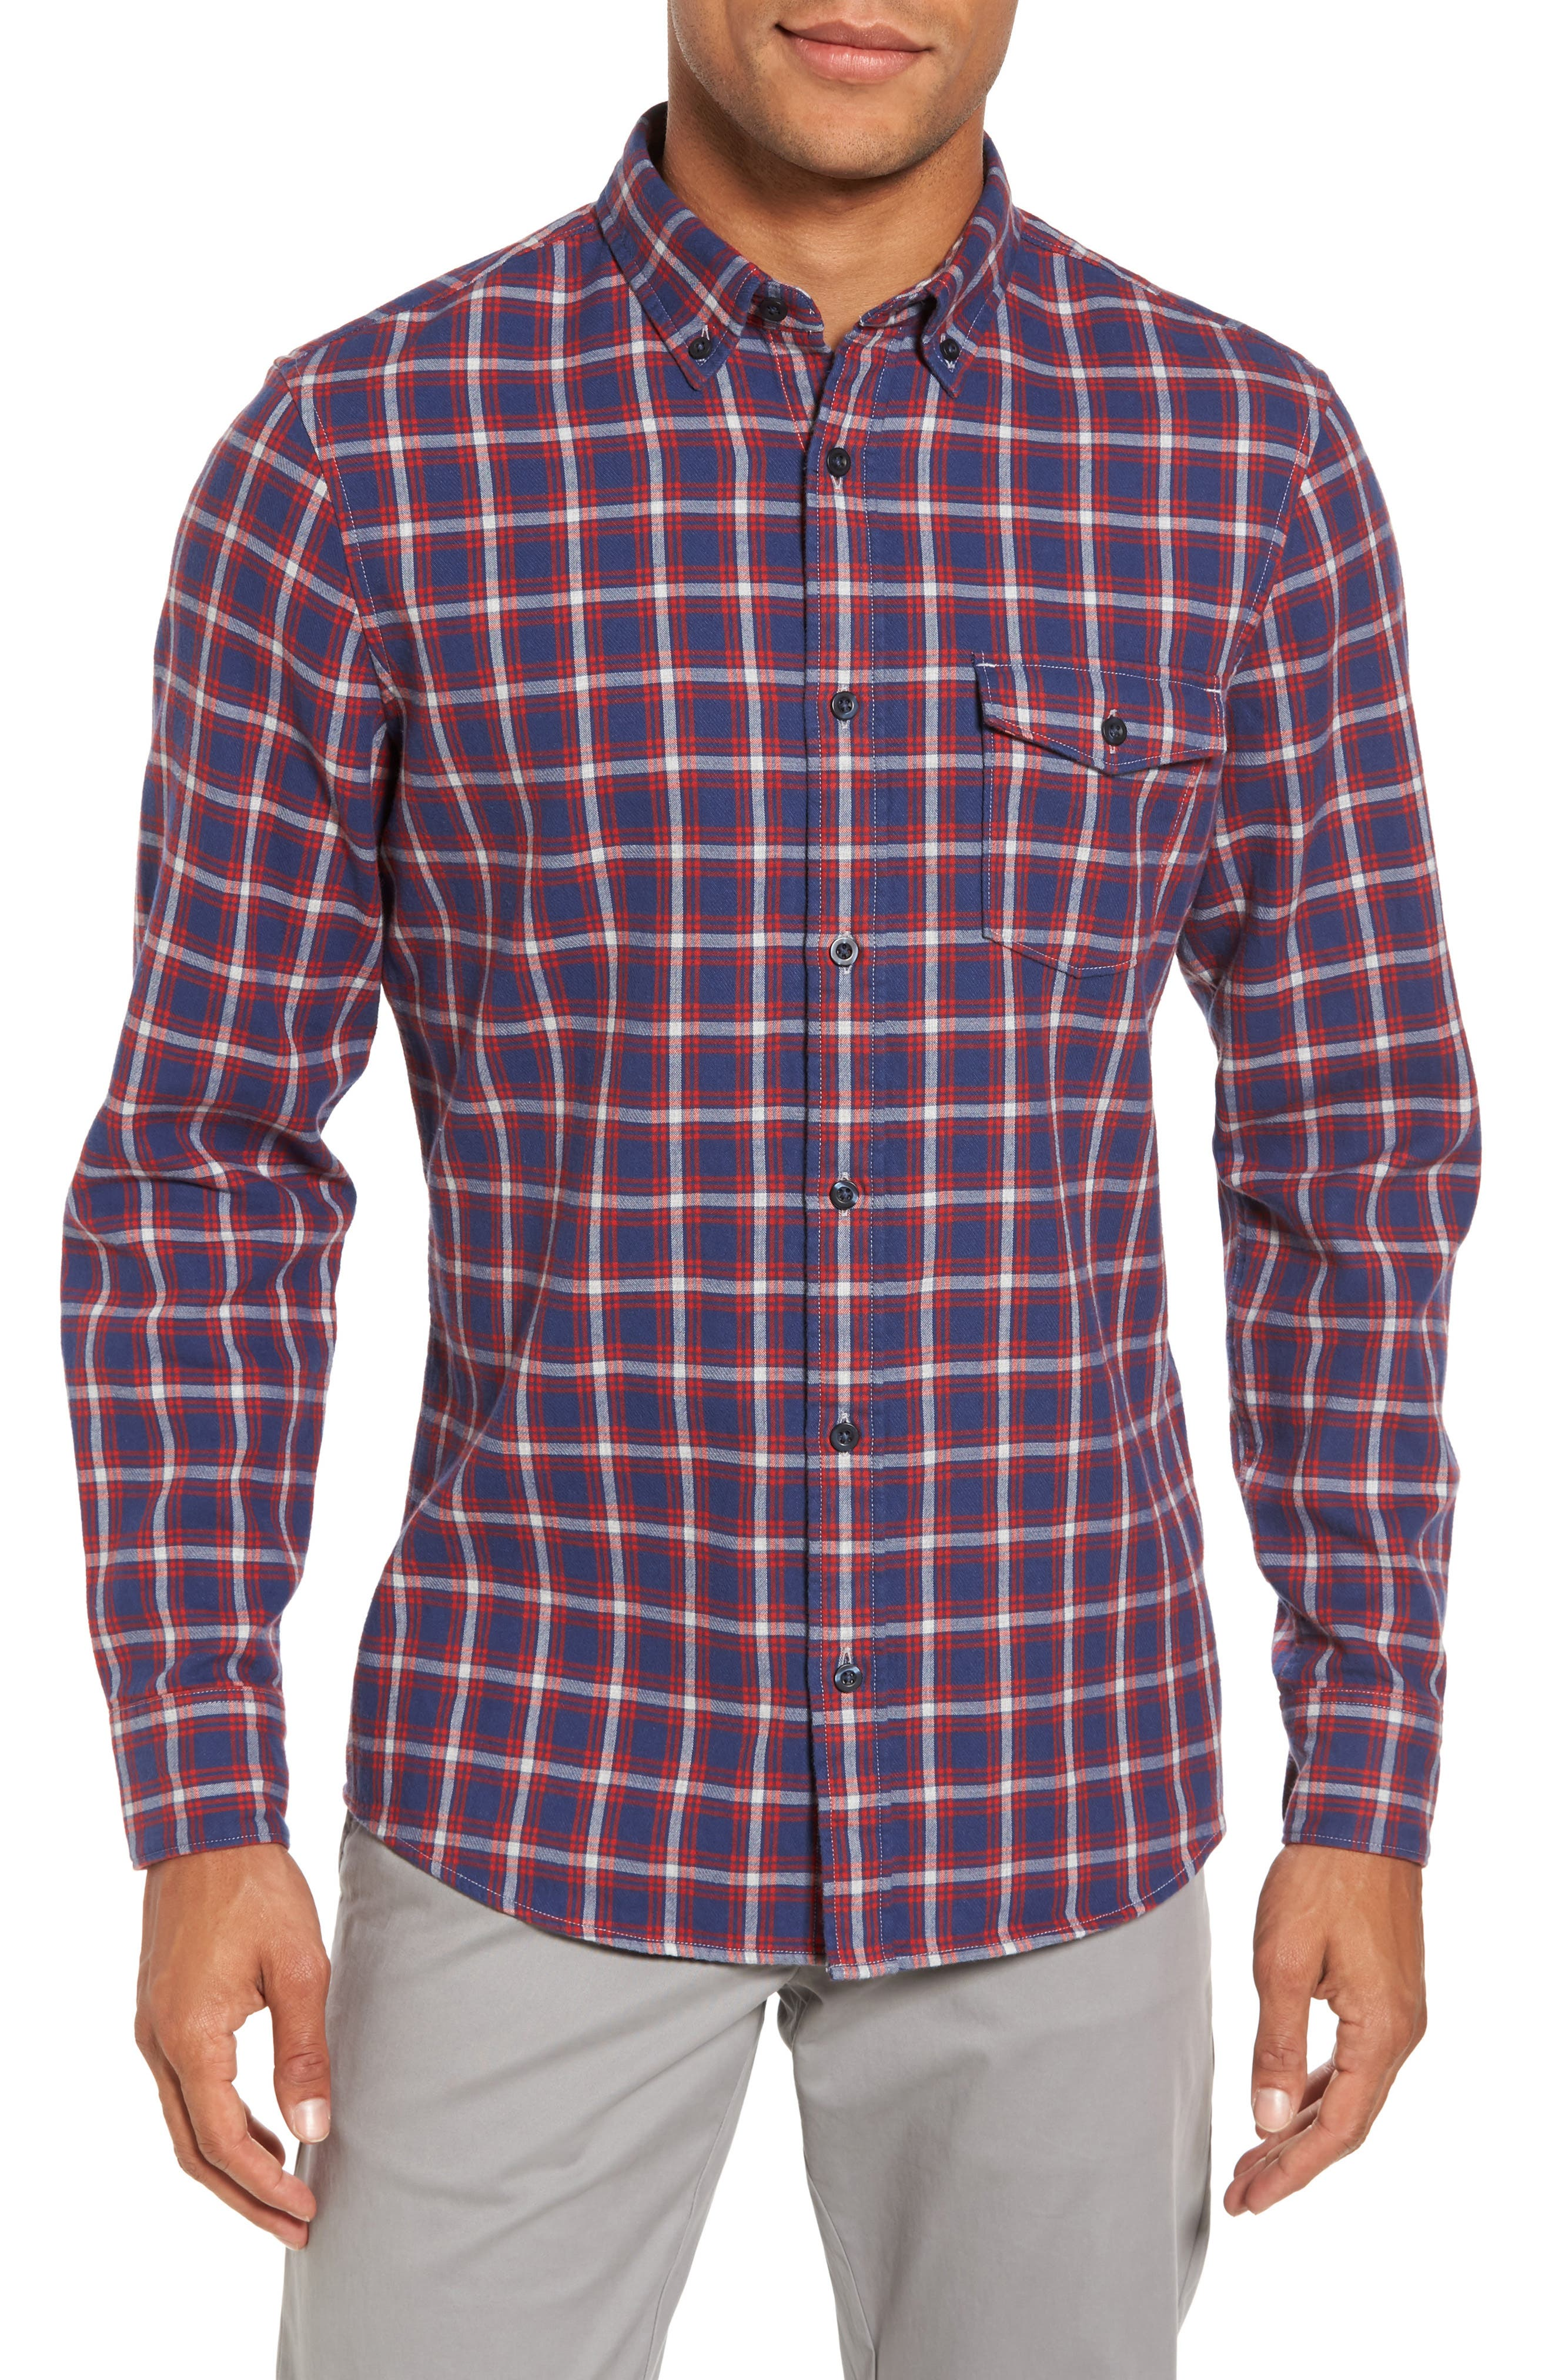 Alternate Image 1 Selected - Nordstrom Men's Shop Trim Fit Duofold Check Sport Shirt